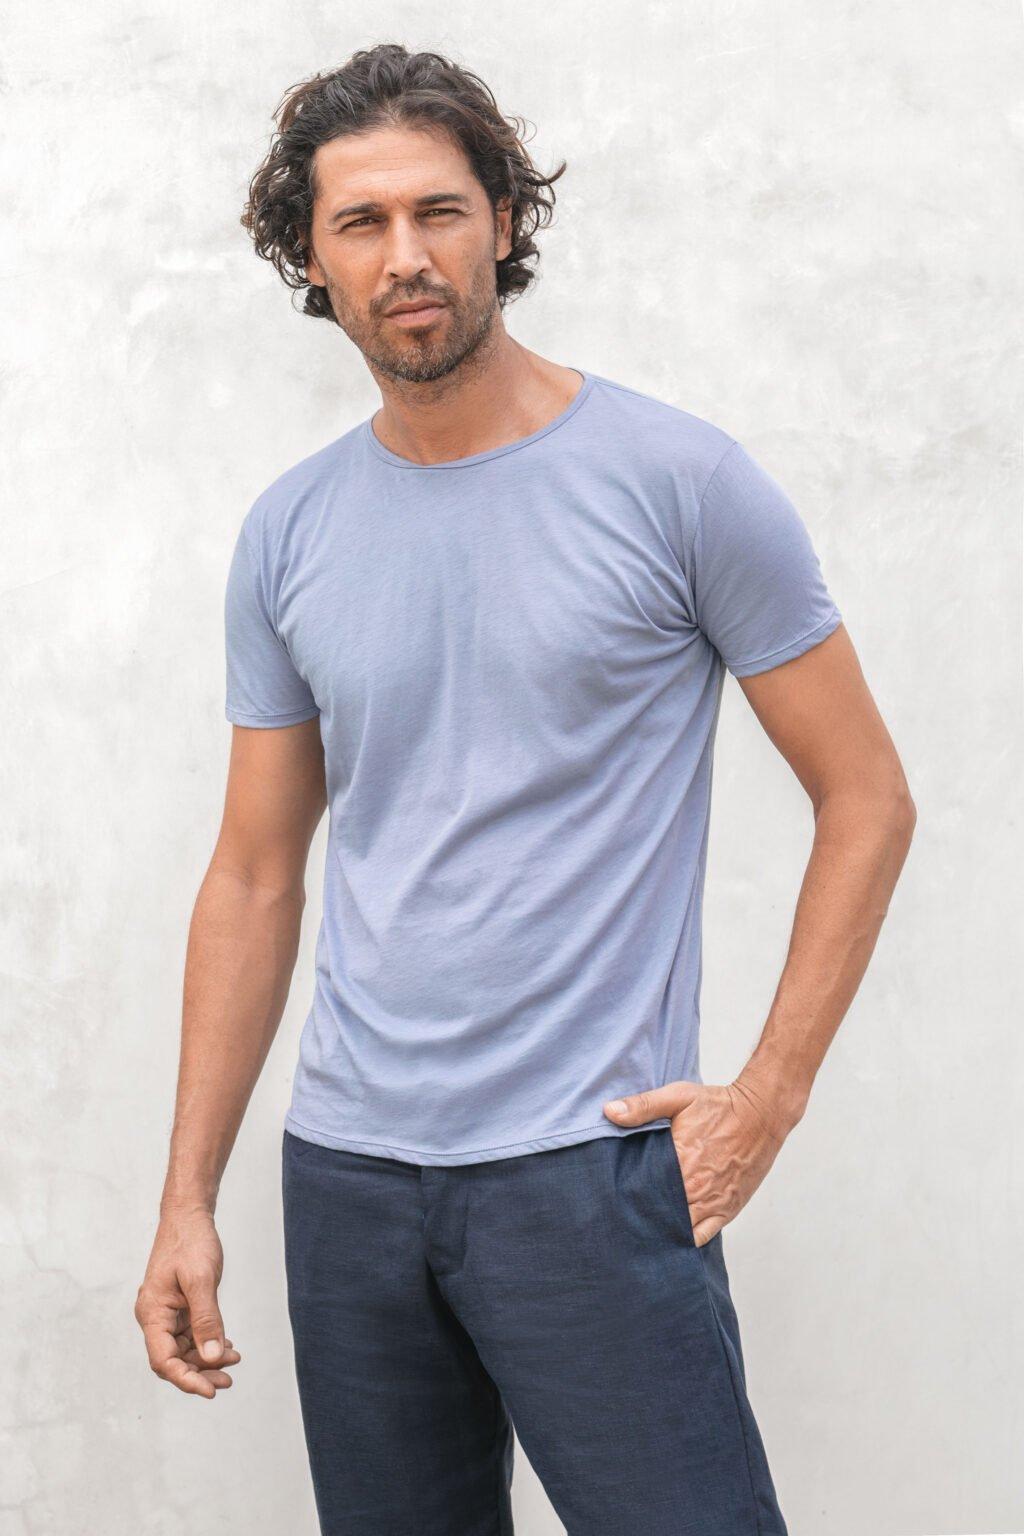 NUBE pima cotton crewneck teeshirt